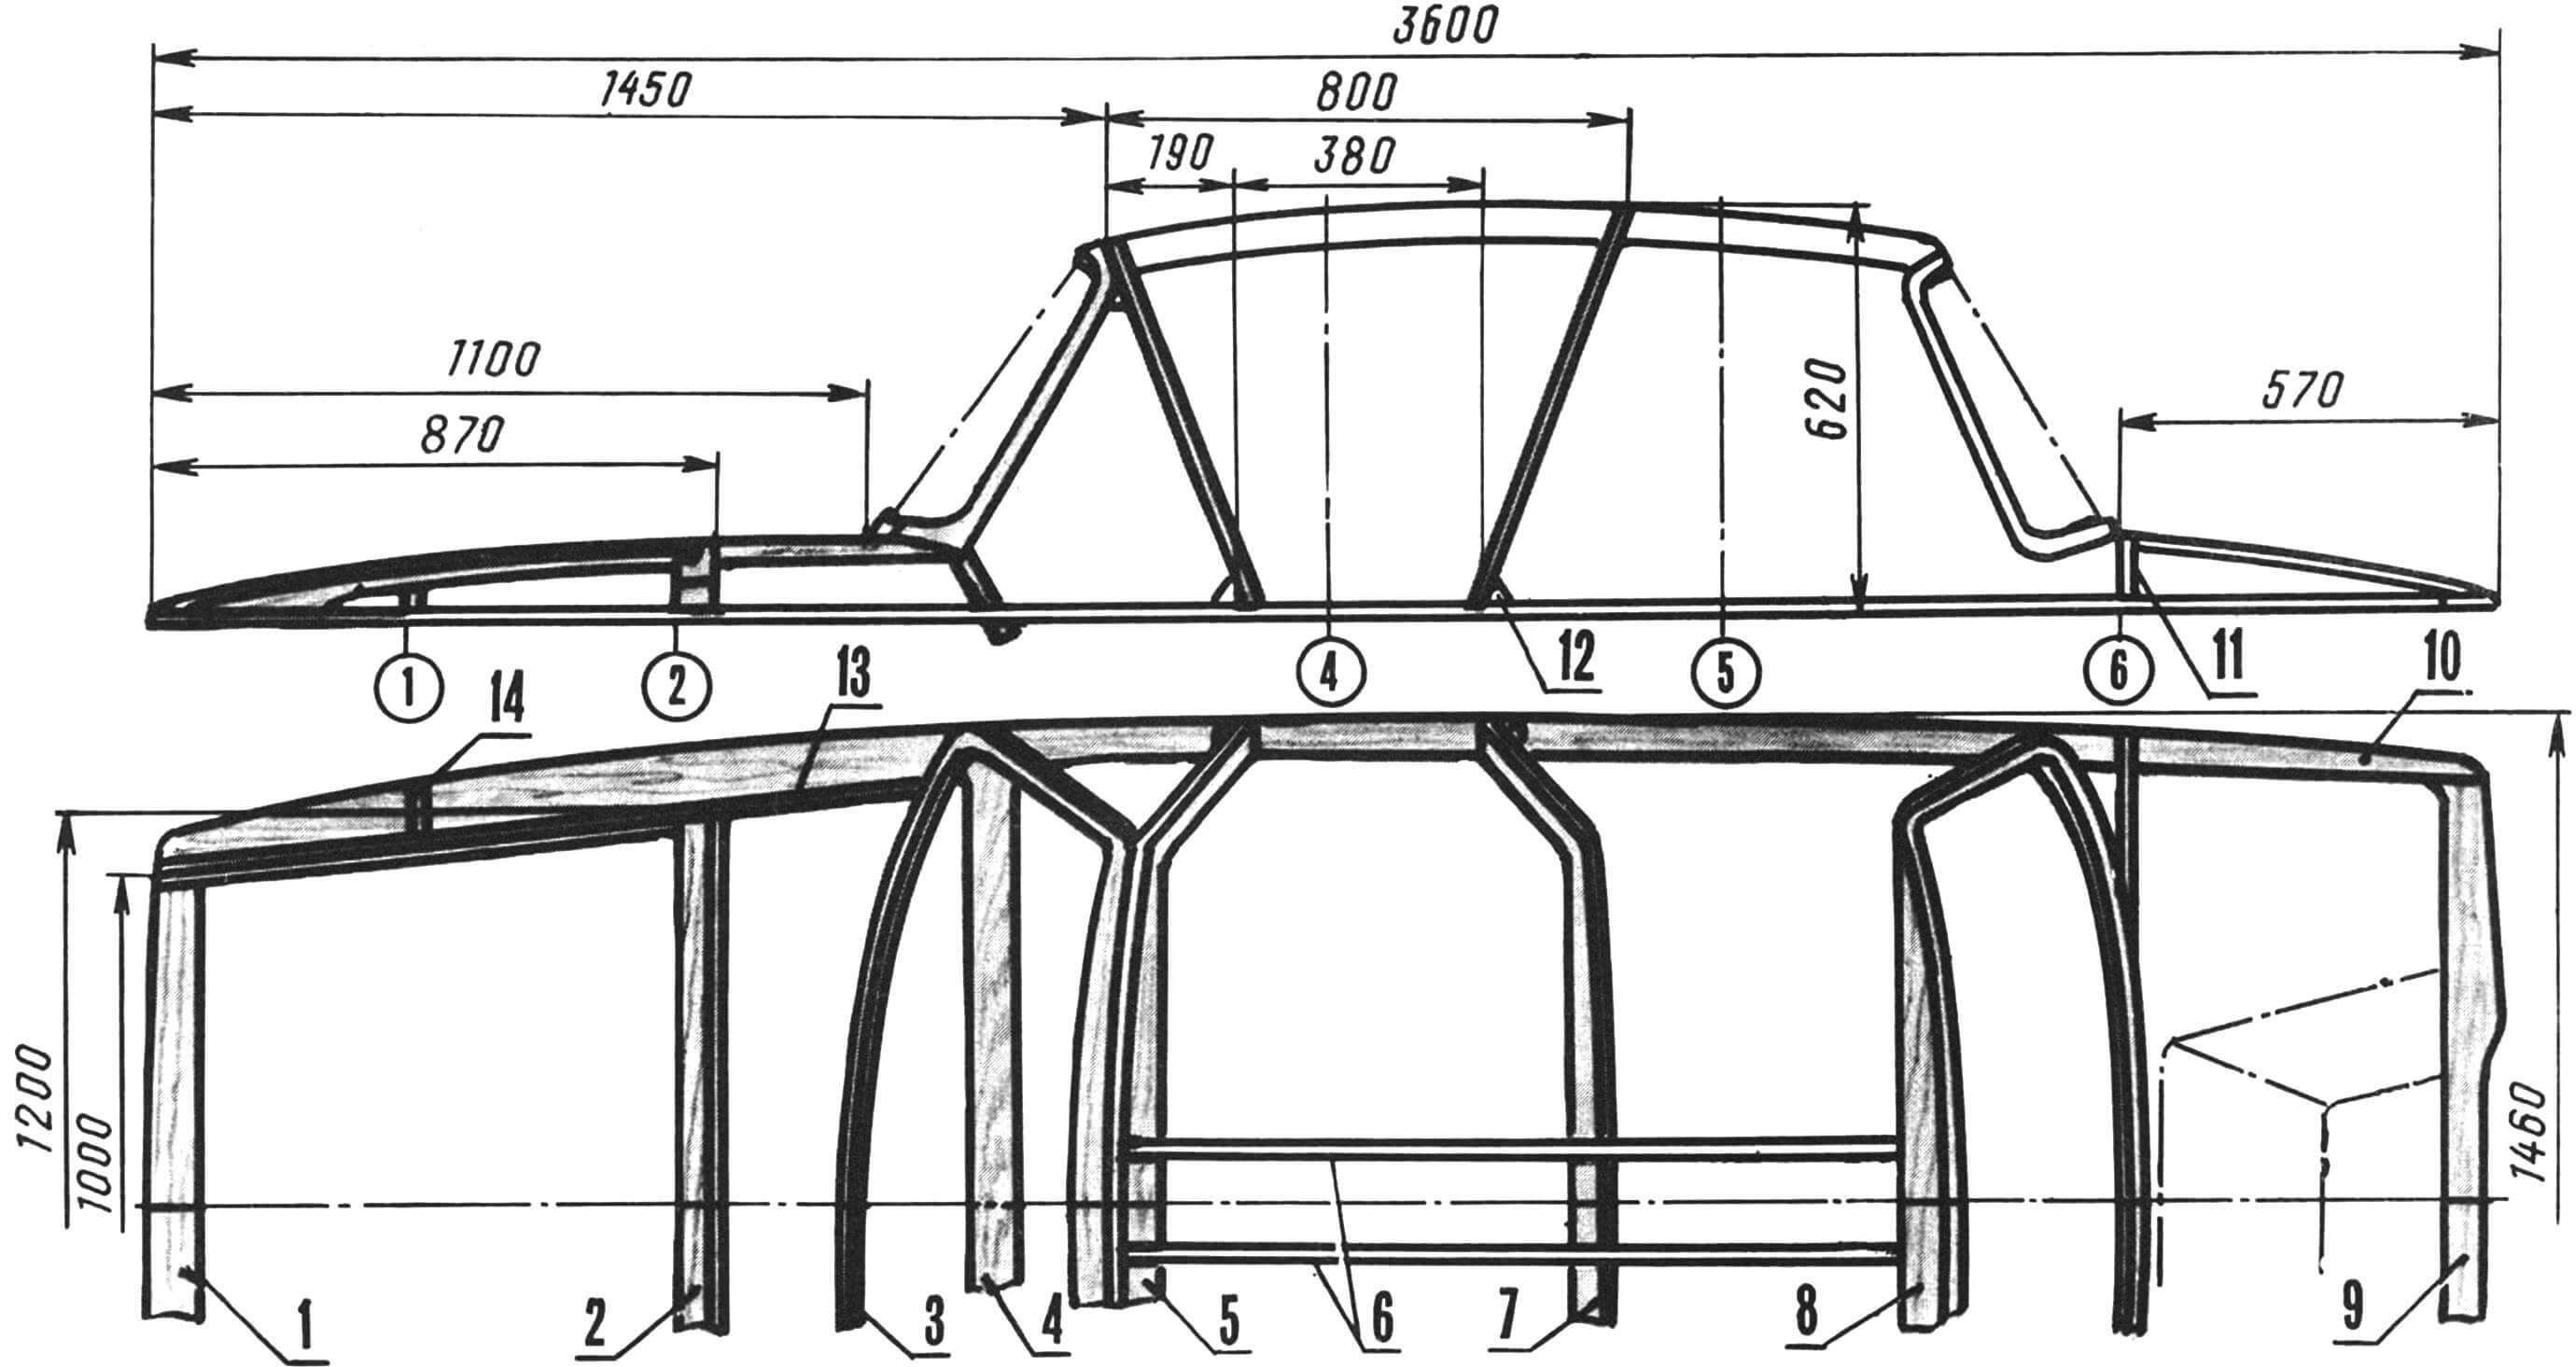 Рис. 3. Каркас верхней части корпуса катера